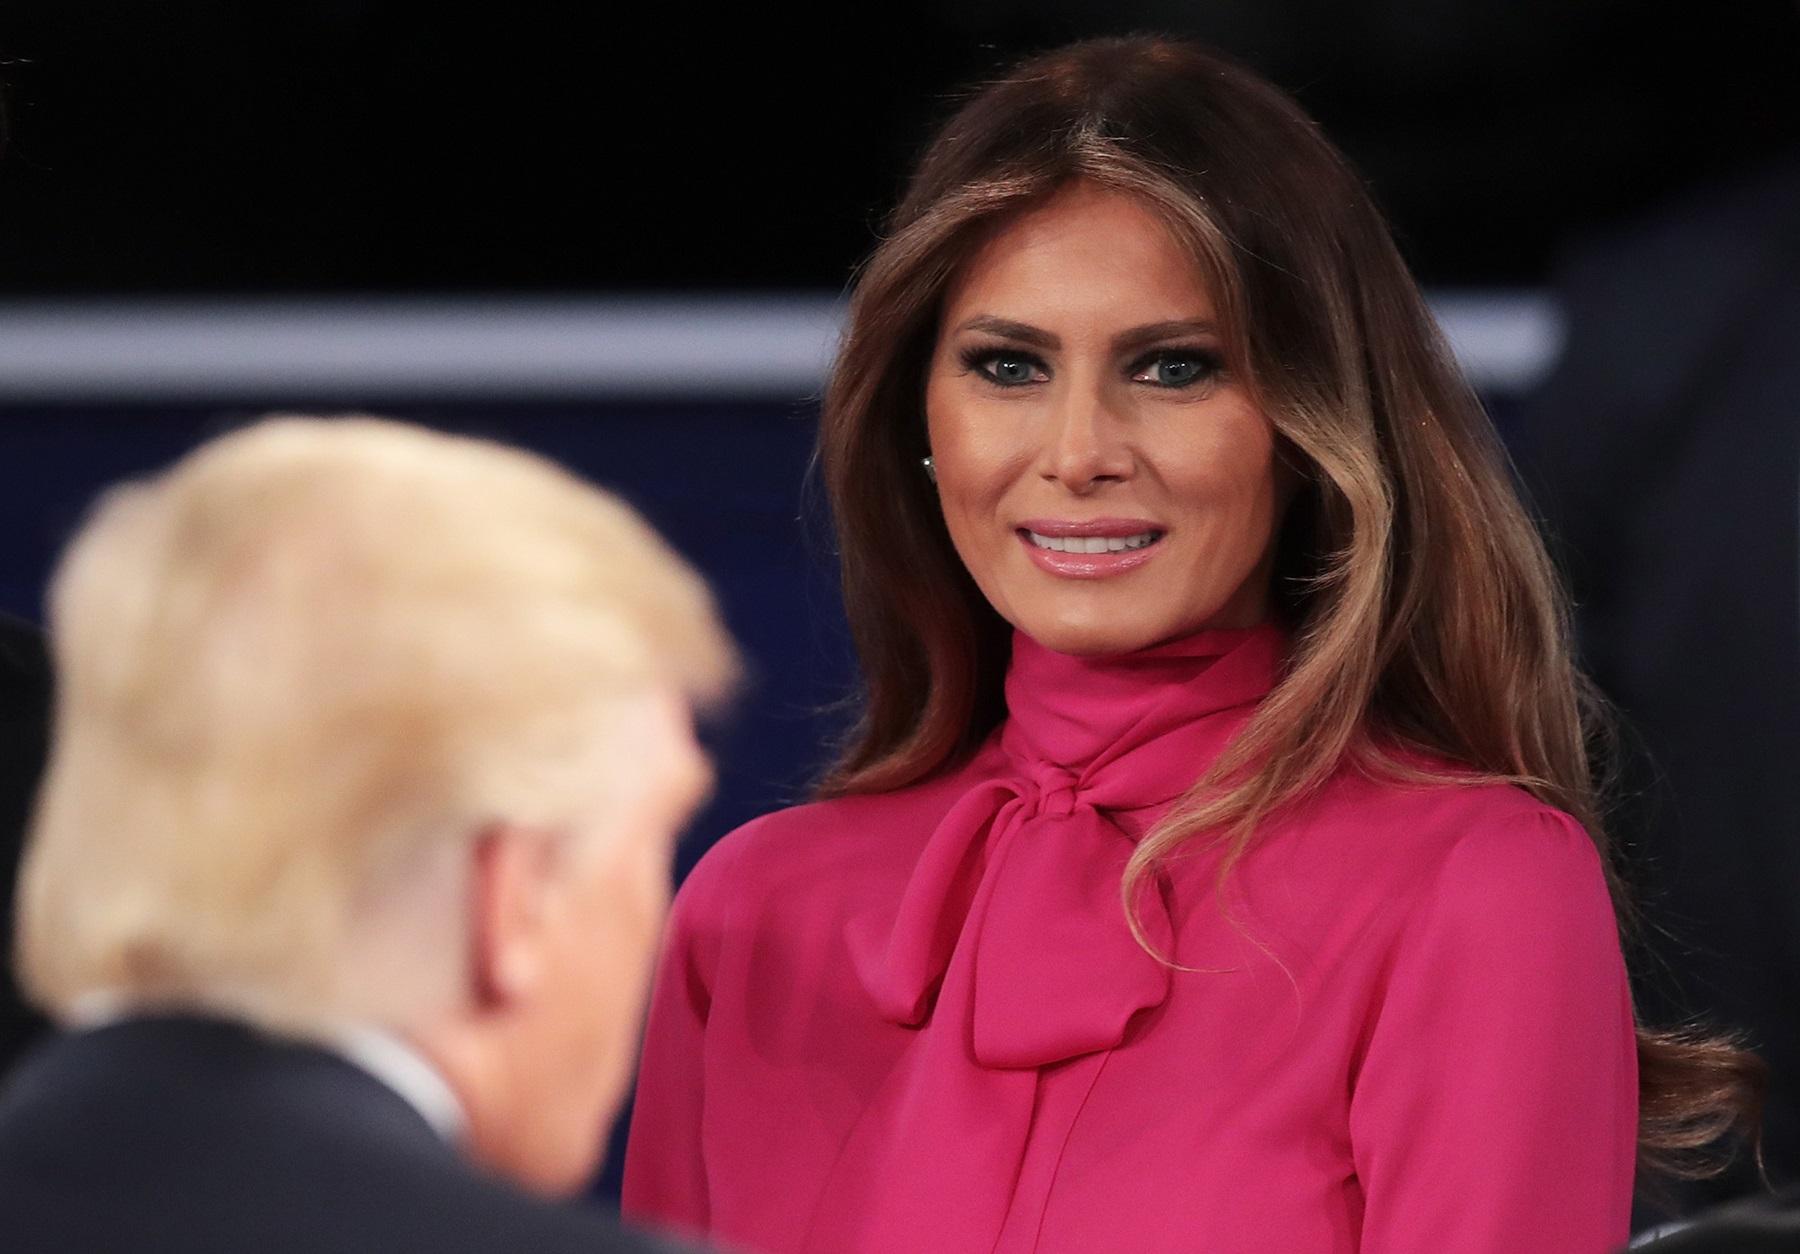 Donald Trump Melania New Fashion Move